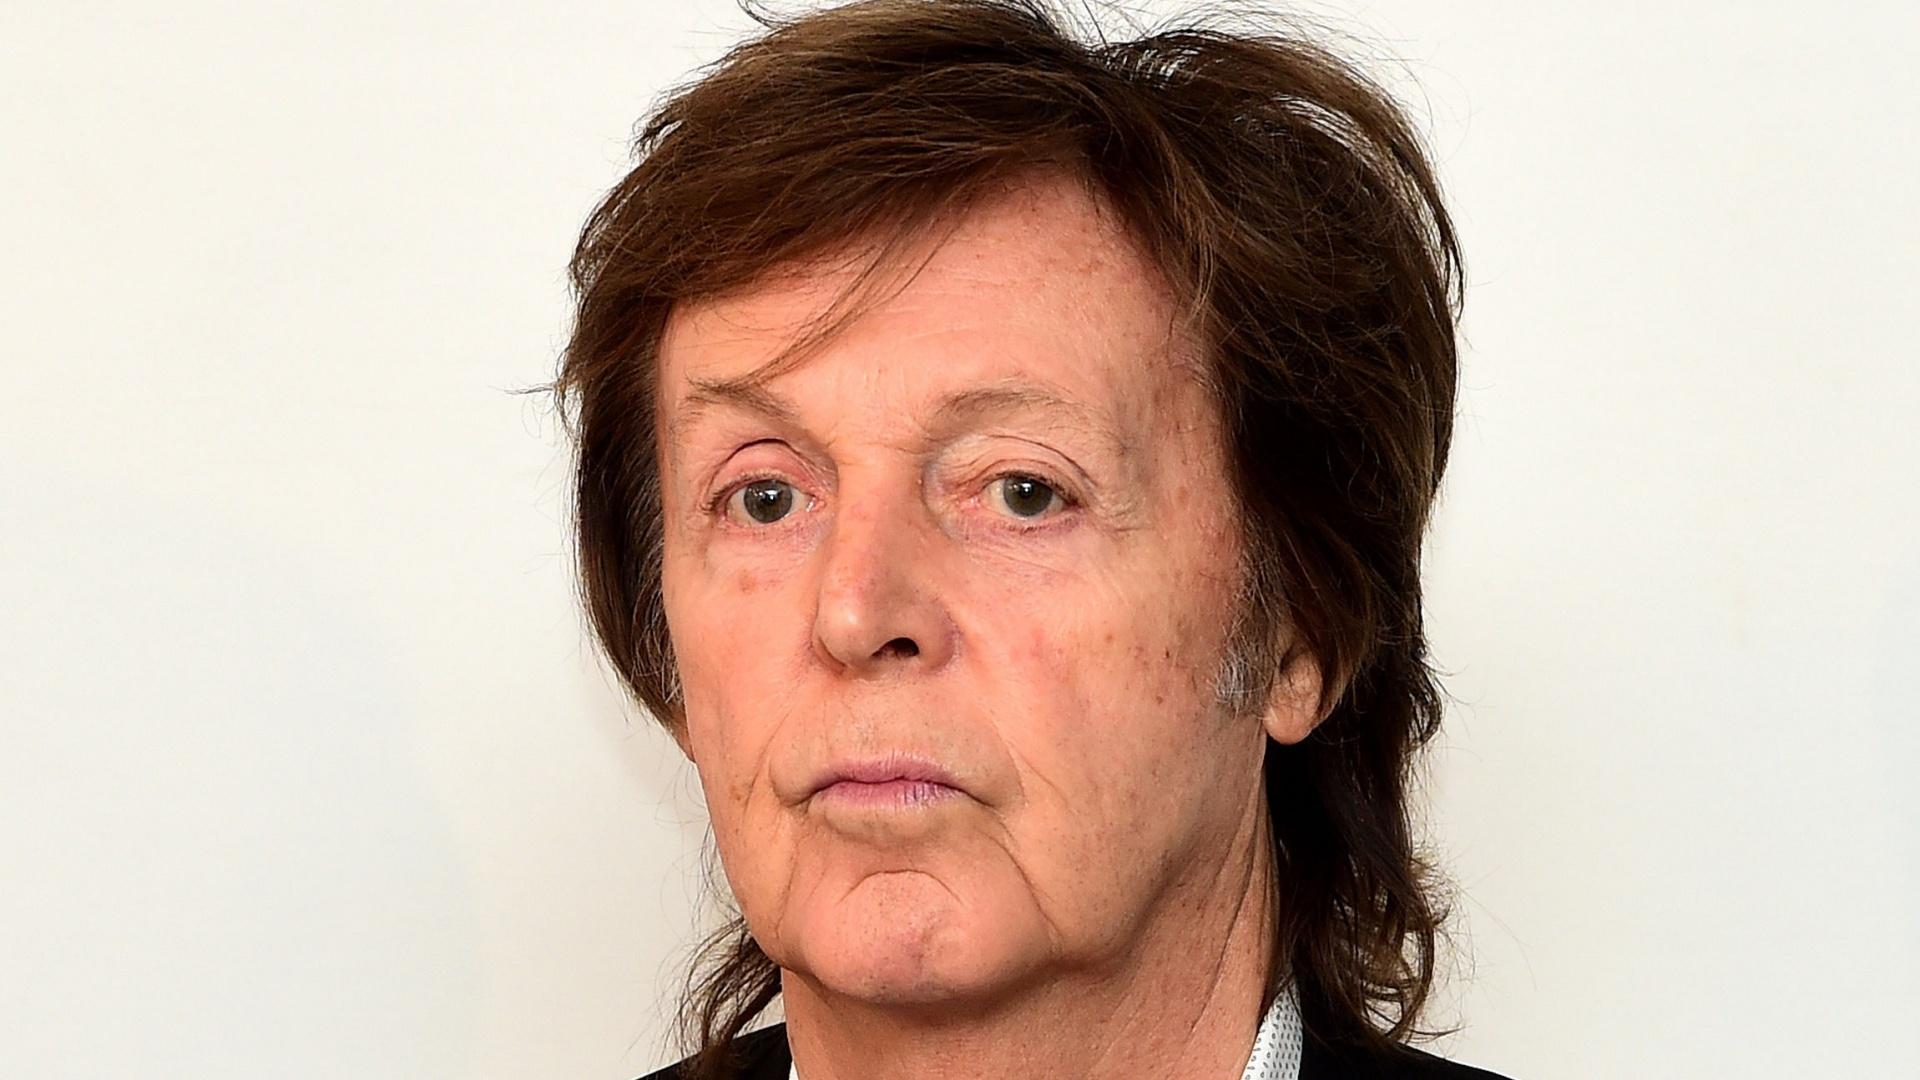 Sir Paul McCartney (PA)